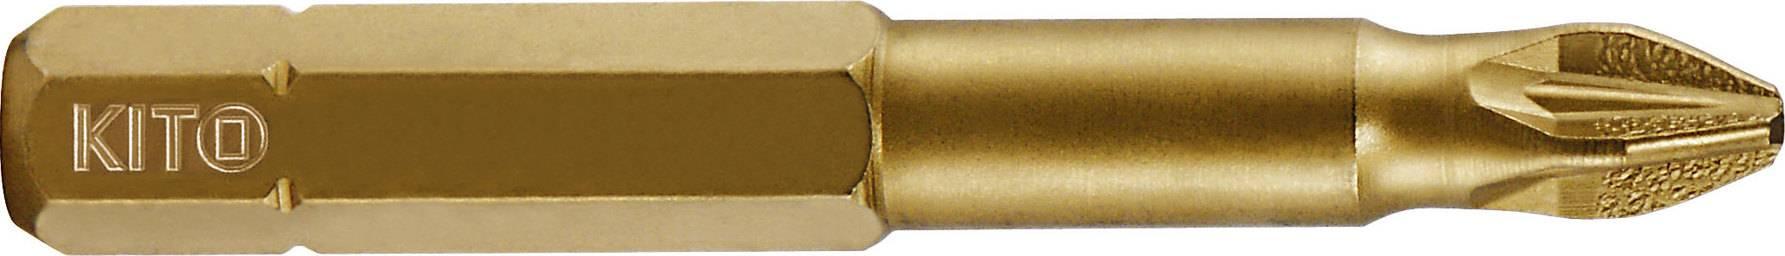 hrot, PZ 1x50mm, S2/TiN 4821201 KITO